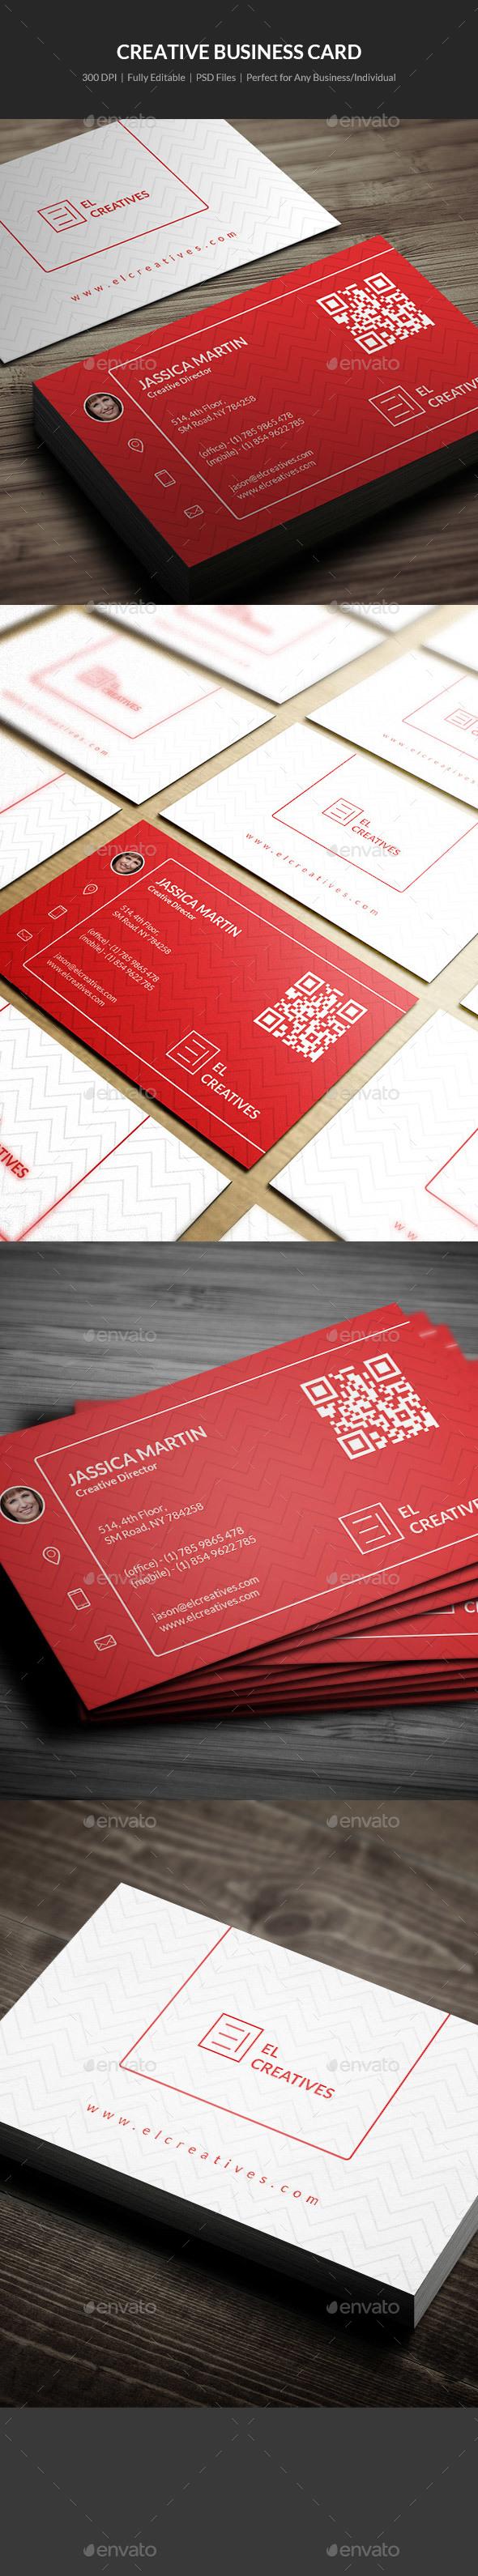 Creative Business Card - 02 - Creative Business Cards